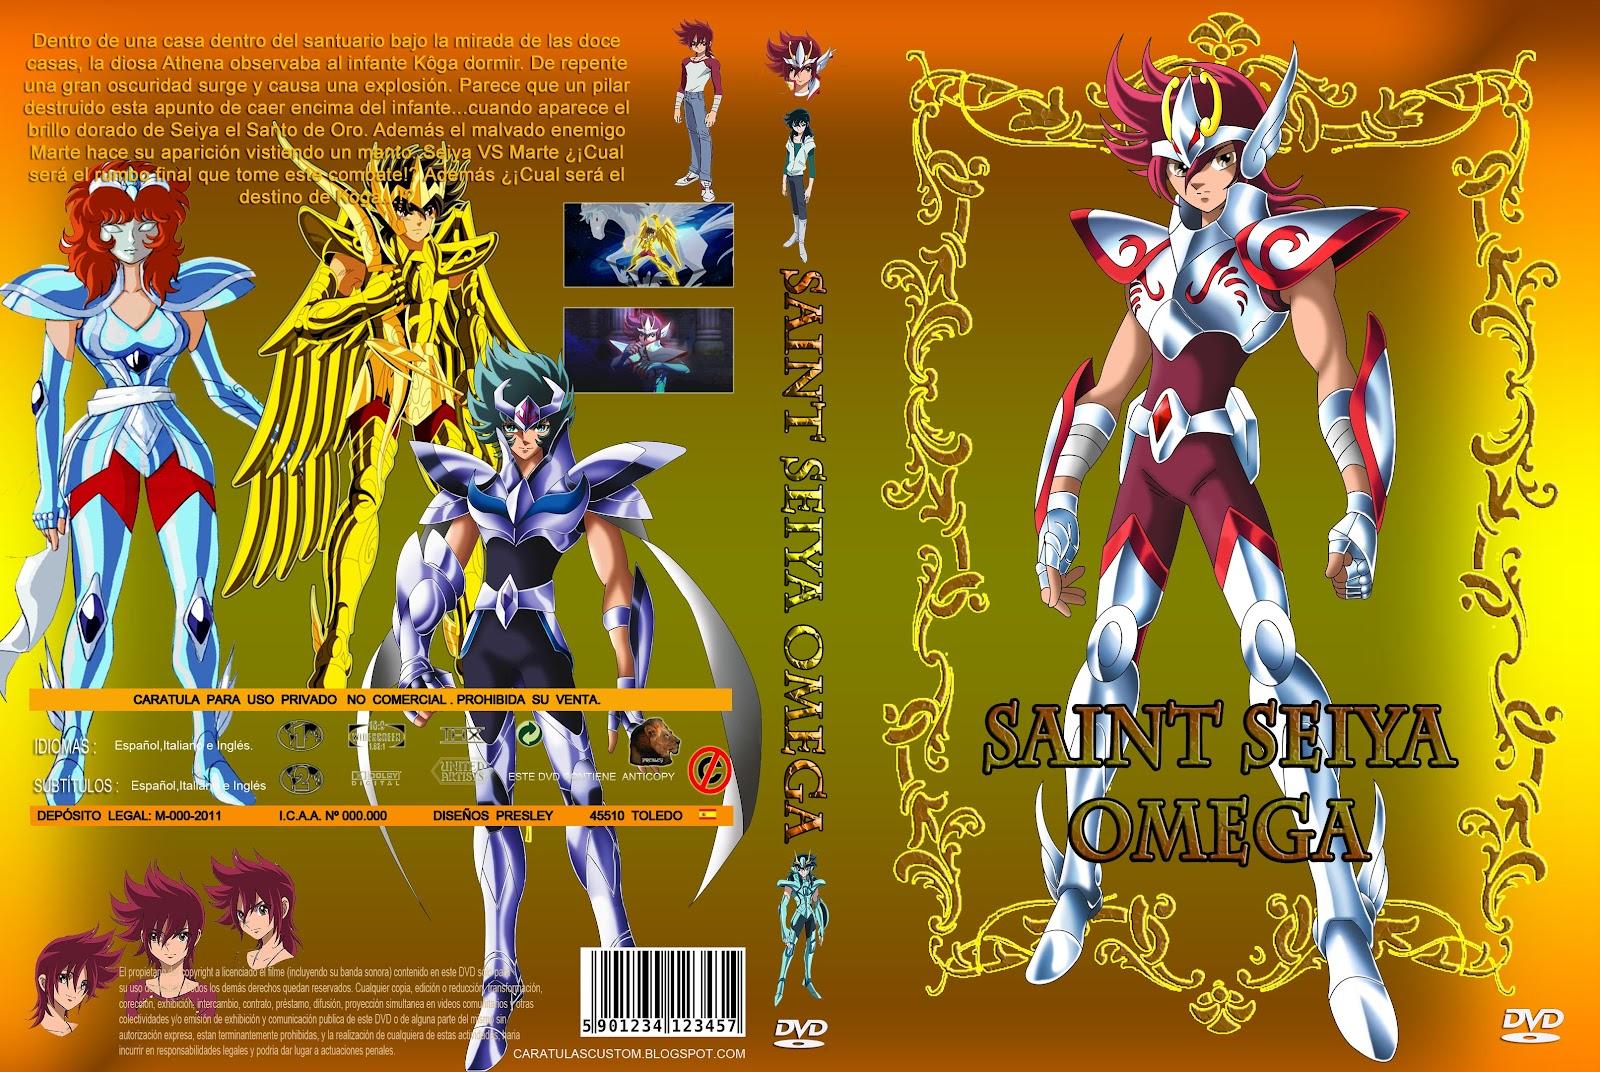 Saint Seiya Omega / Temp 2 (Mp4) (Jap / Subtitulada) (DF/(LB)